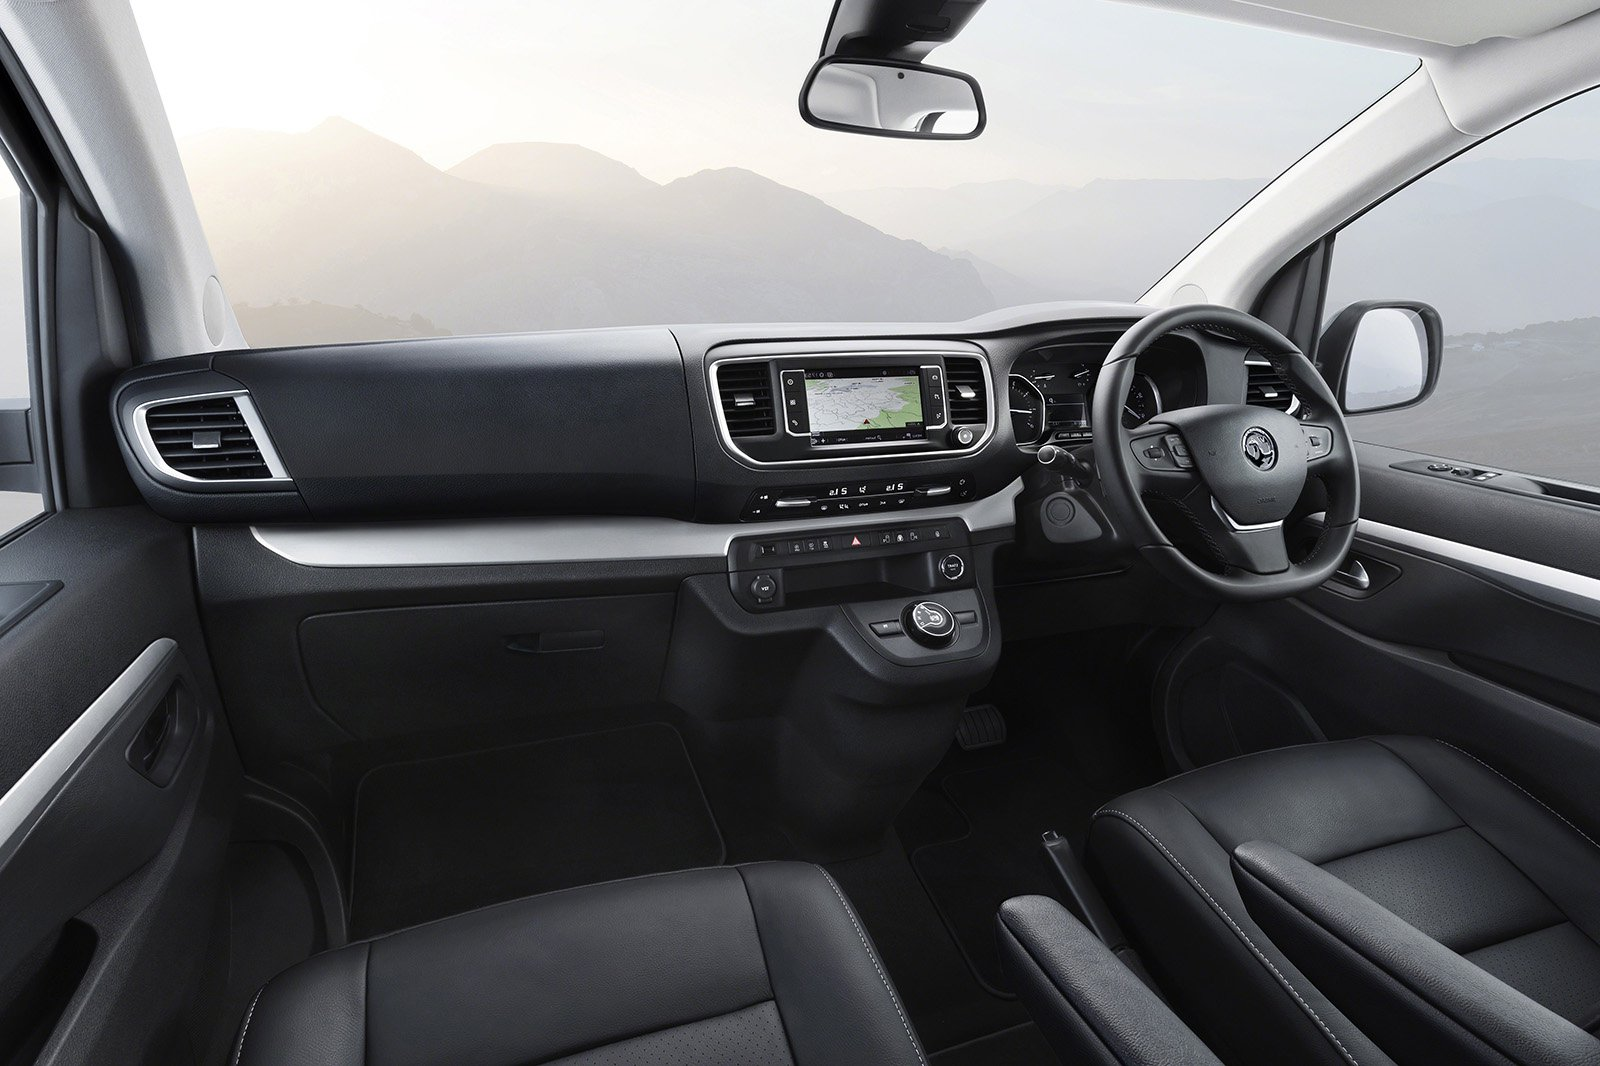 2019 Vauxhall Vivaro Life interior